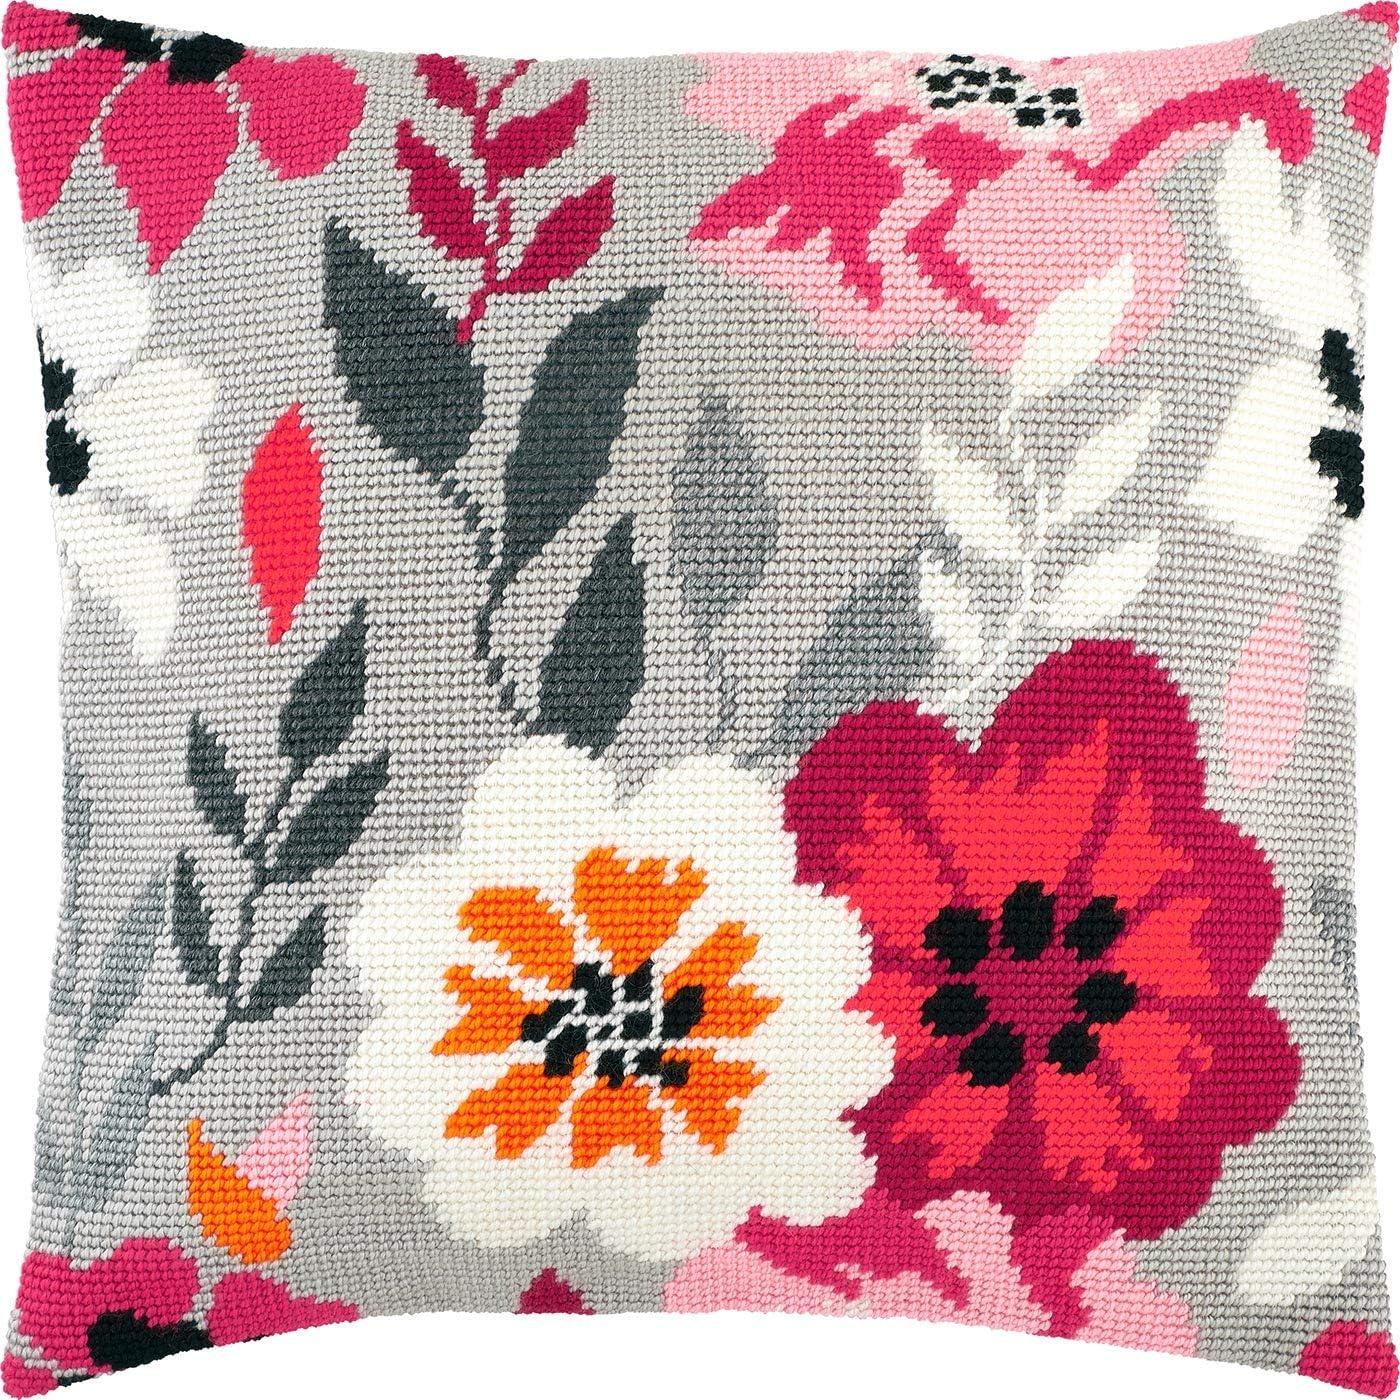 Pink Flowers. 返品送料無料 2020モデル Needlepoint Kit. Throw 16×16 Pillow Printe Inches.